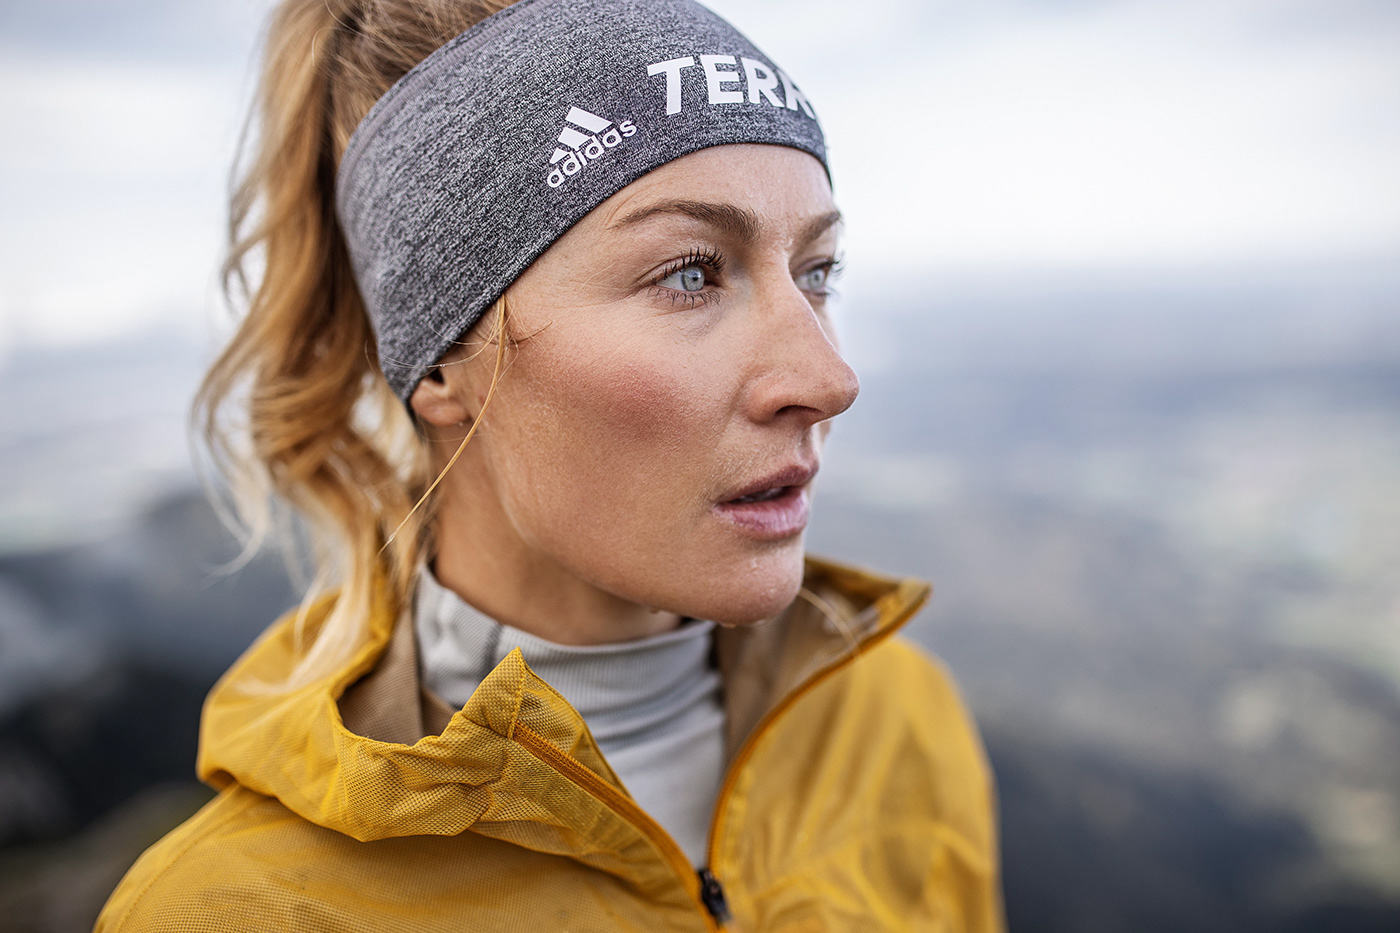 fotograf-sport-zuerich-zalando-adidas-terrex-produktion-trailrunning-commercial-helgeroeske-behance1